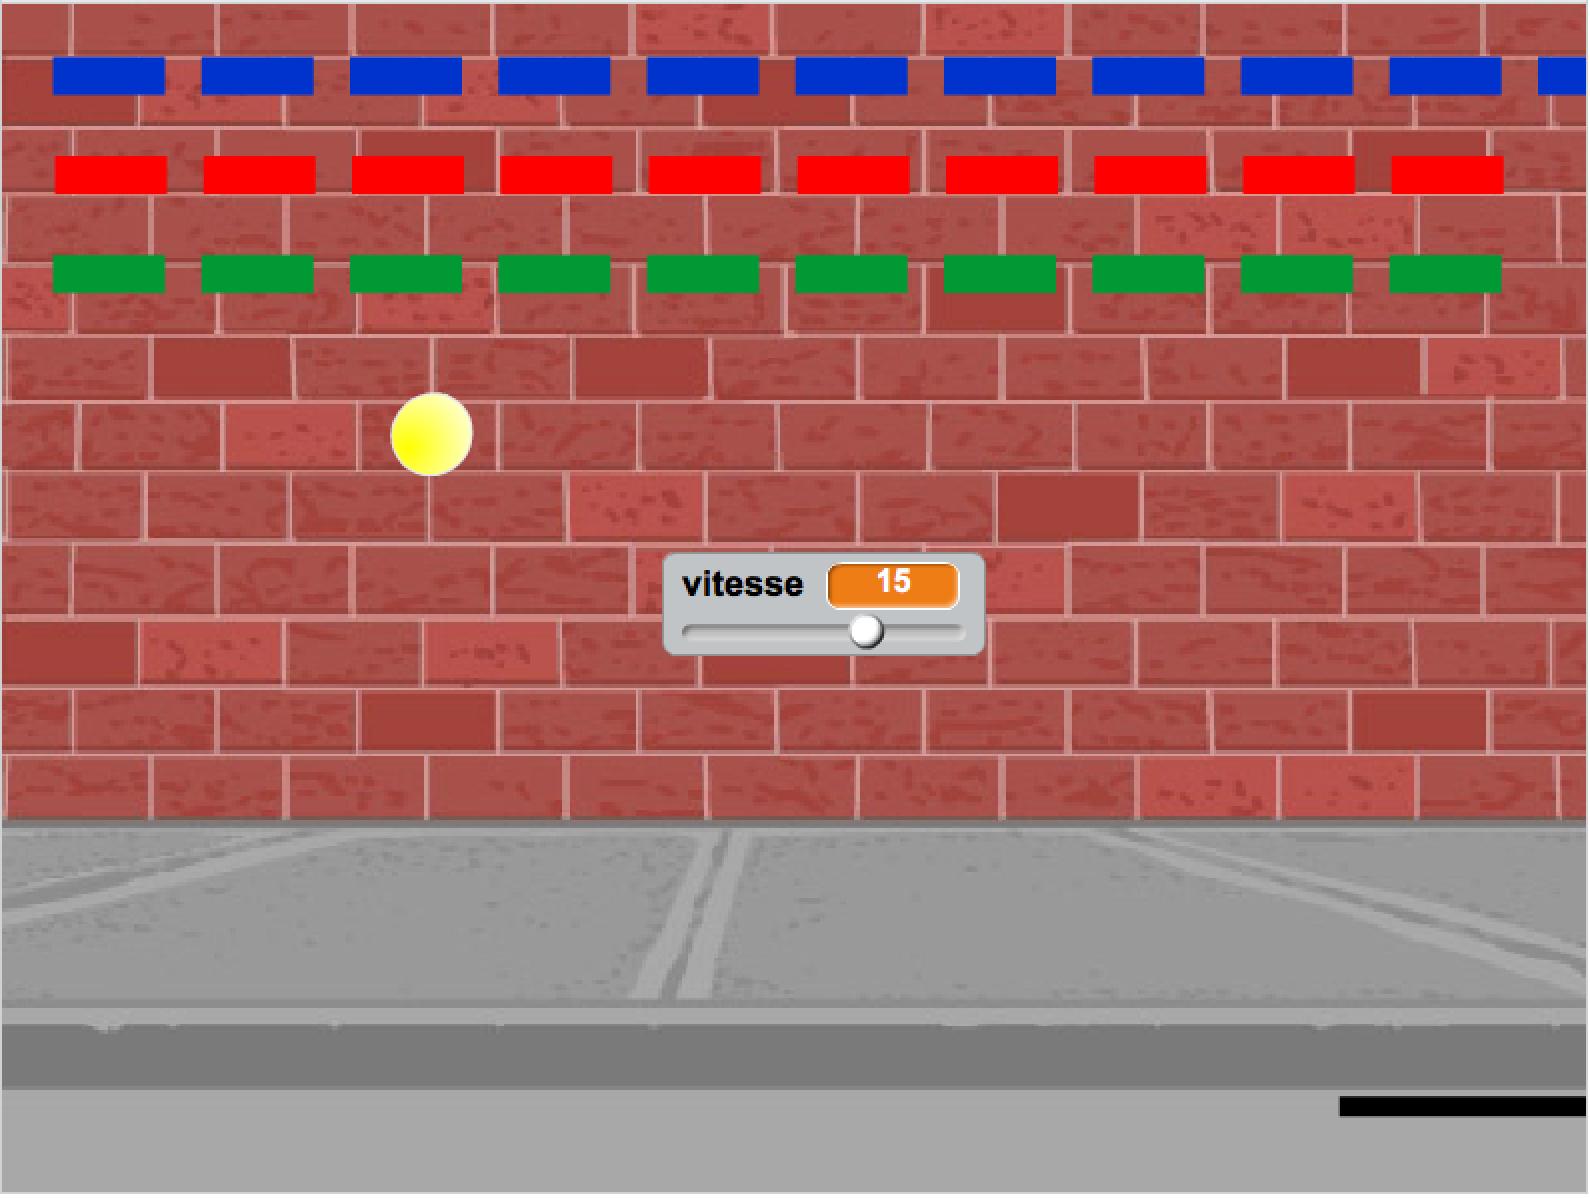 Casse Brique Scratch - Tech Kids Academy à Casse Brick